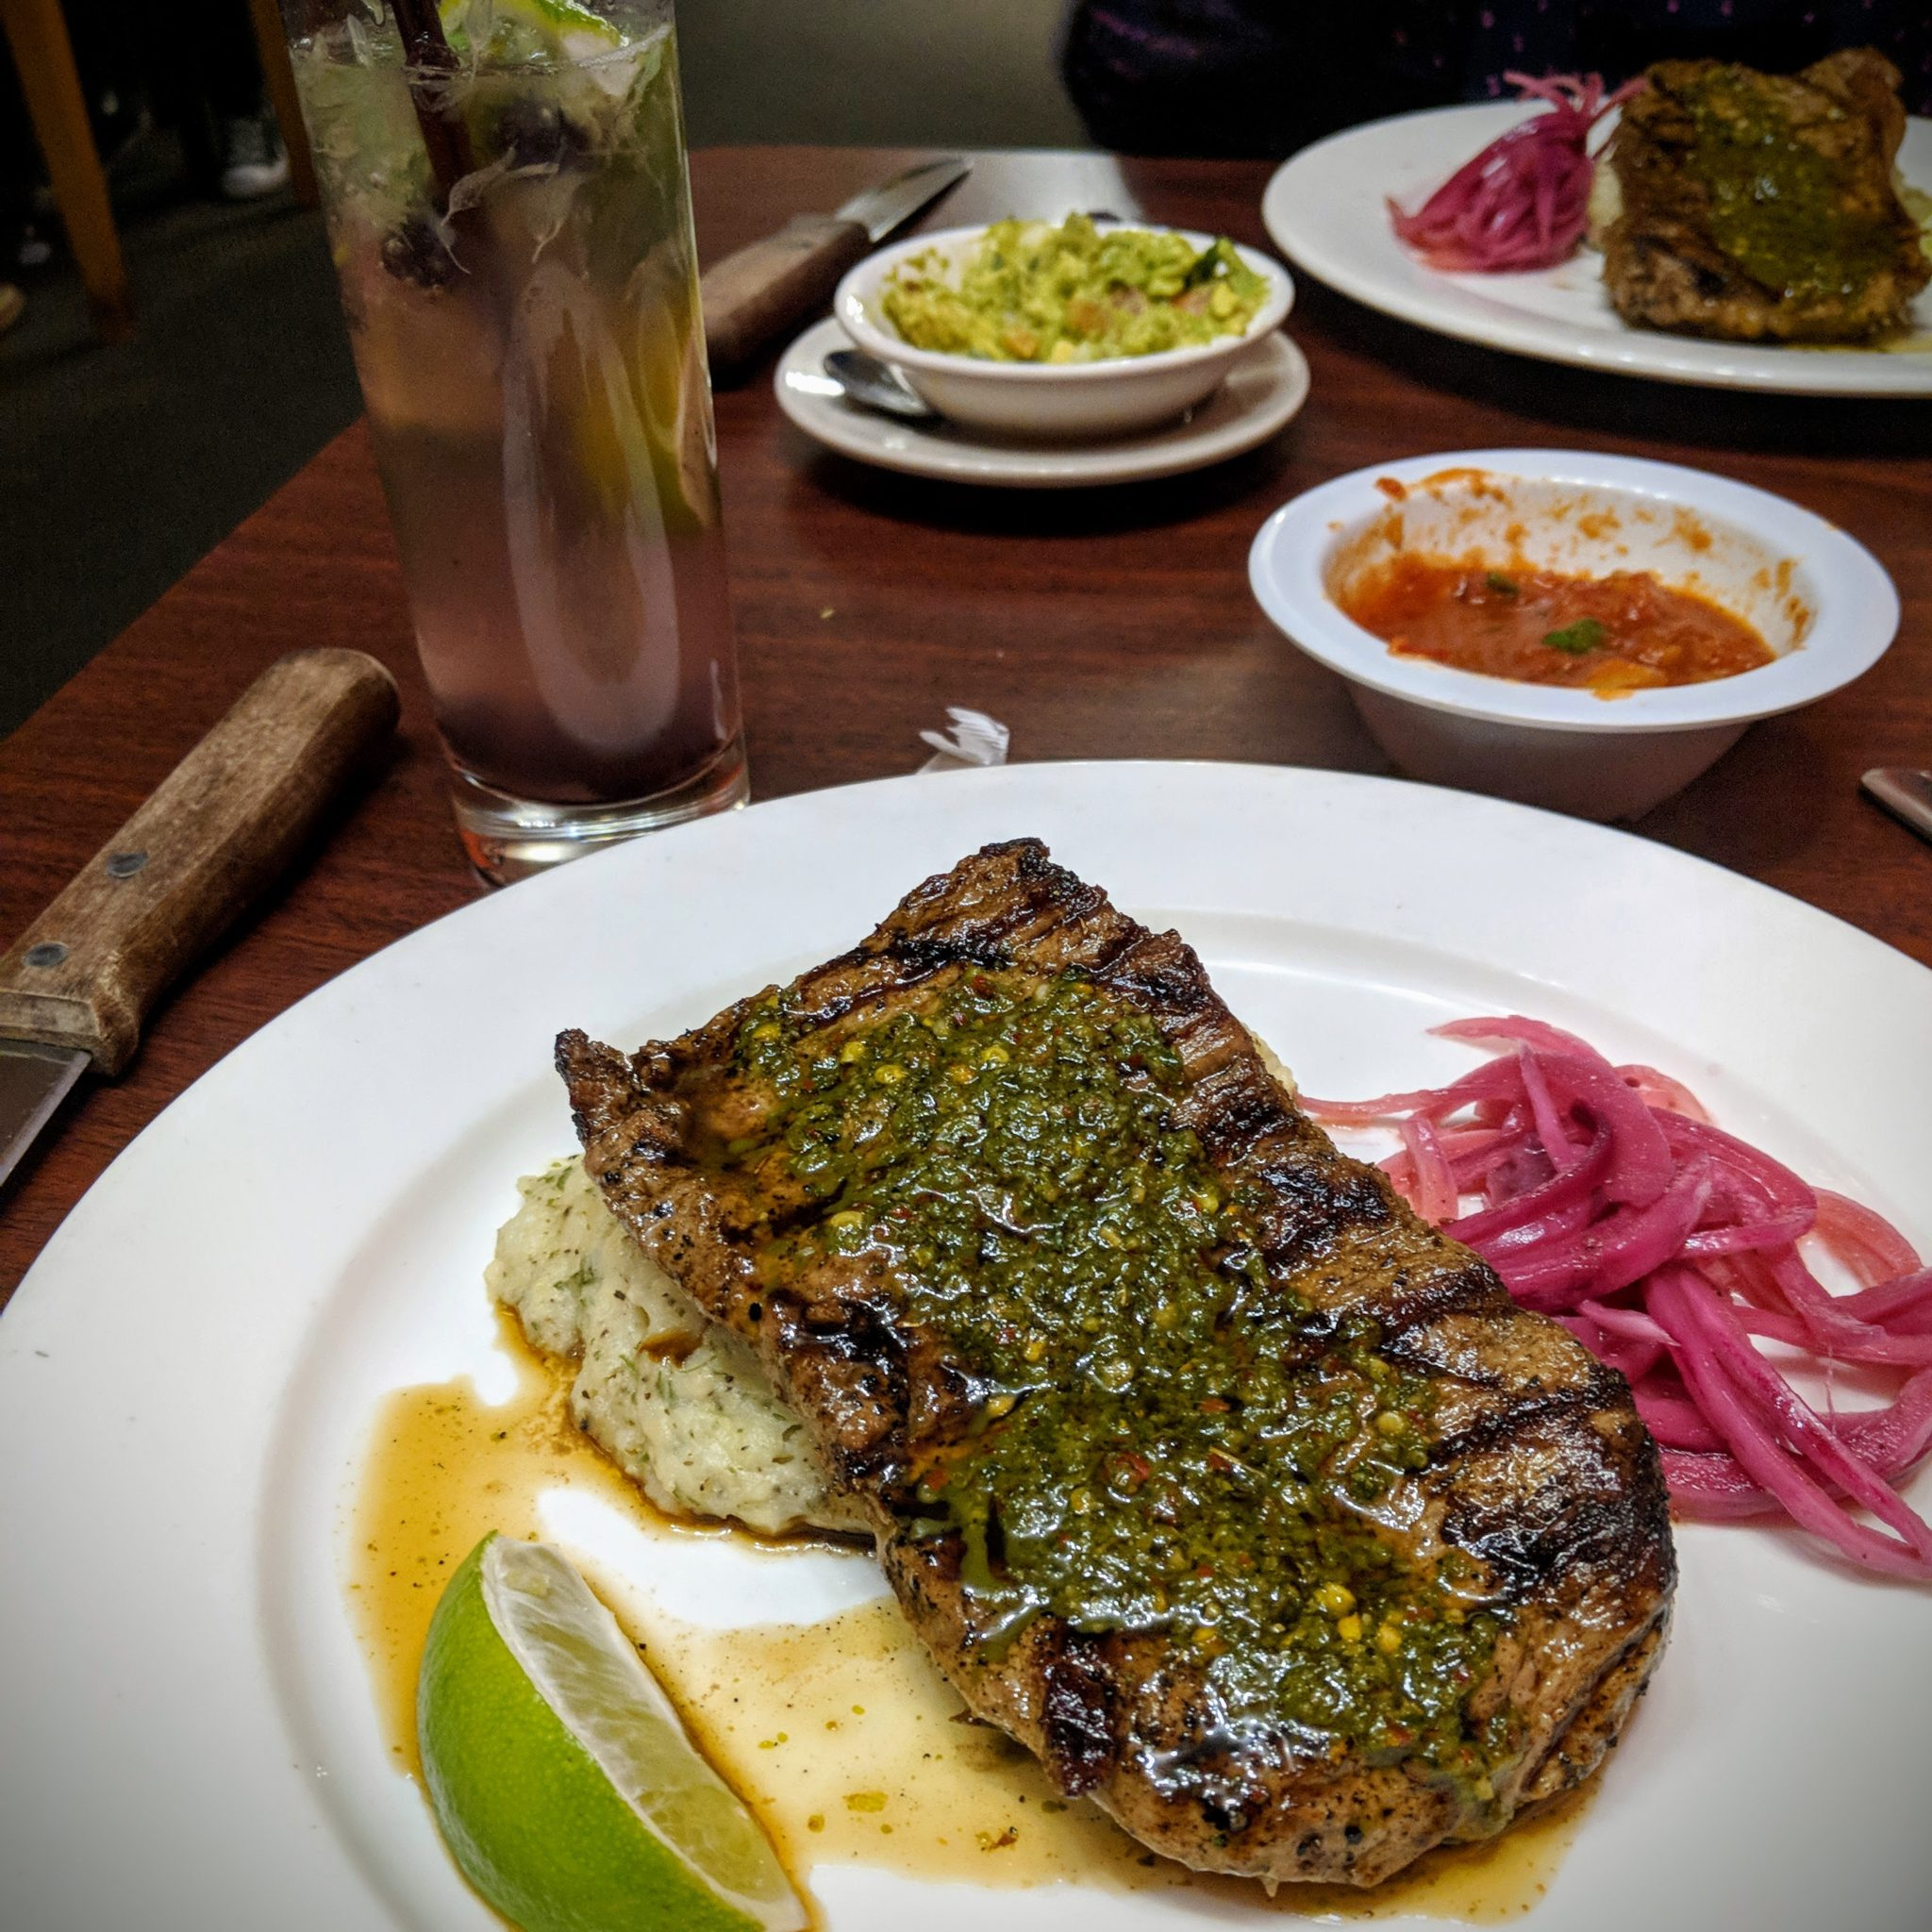 soup and taco, restaurant week, 2018, winter, steak, chimichurri